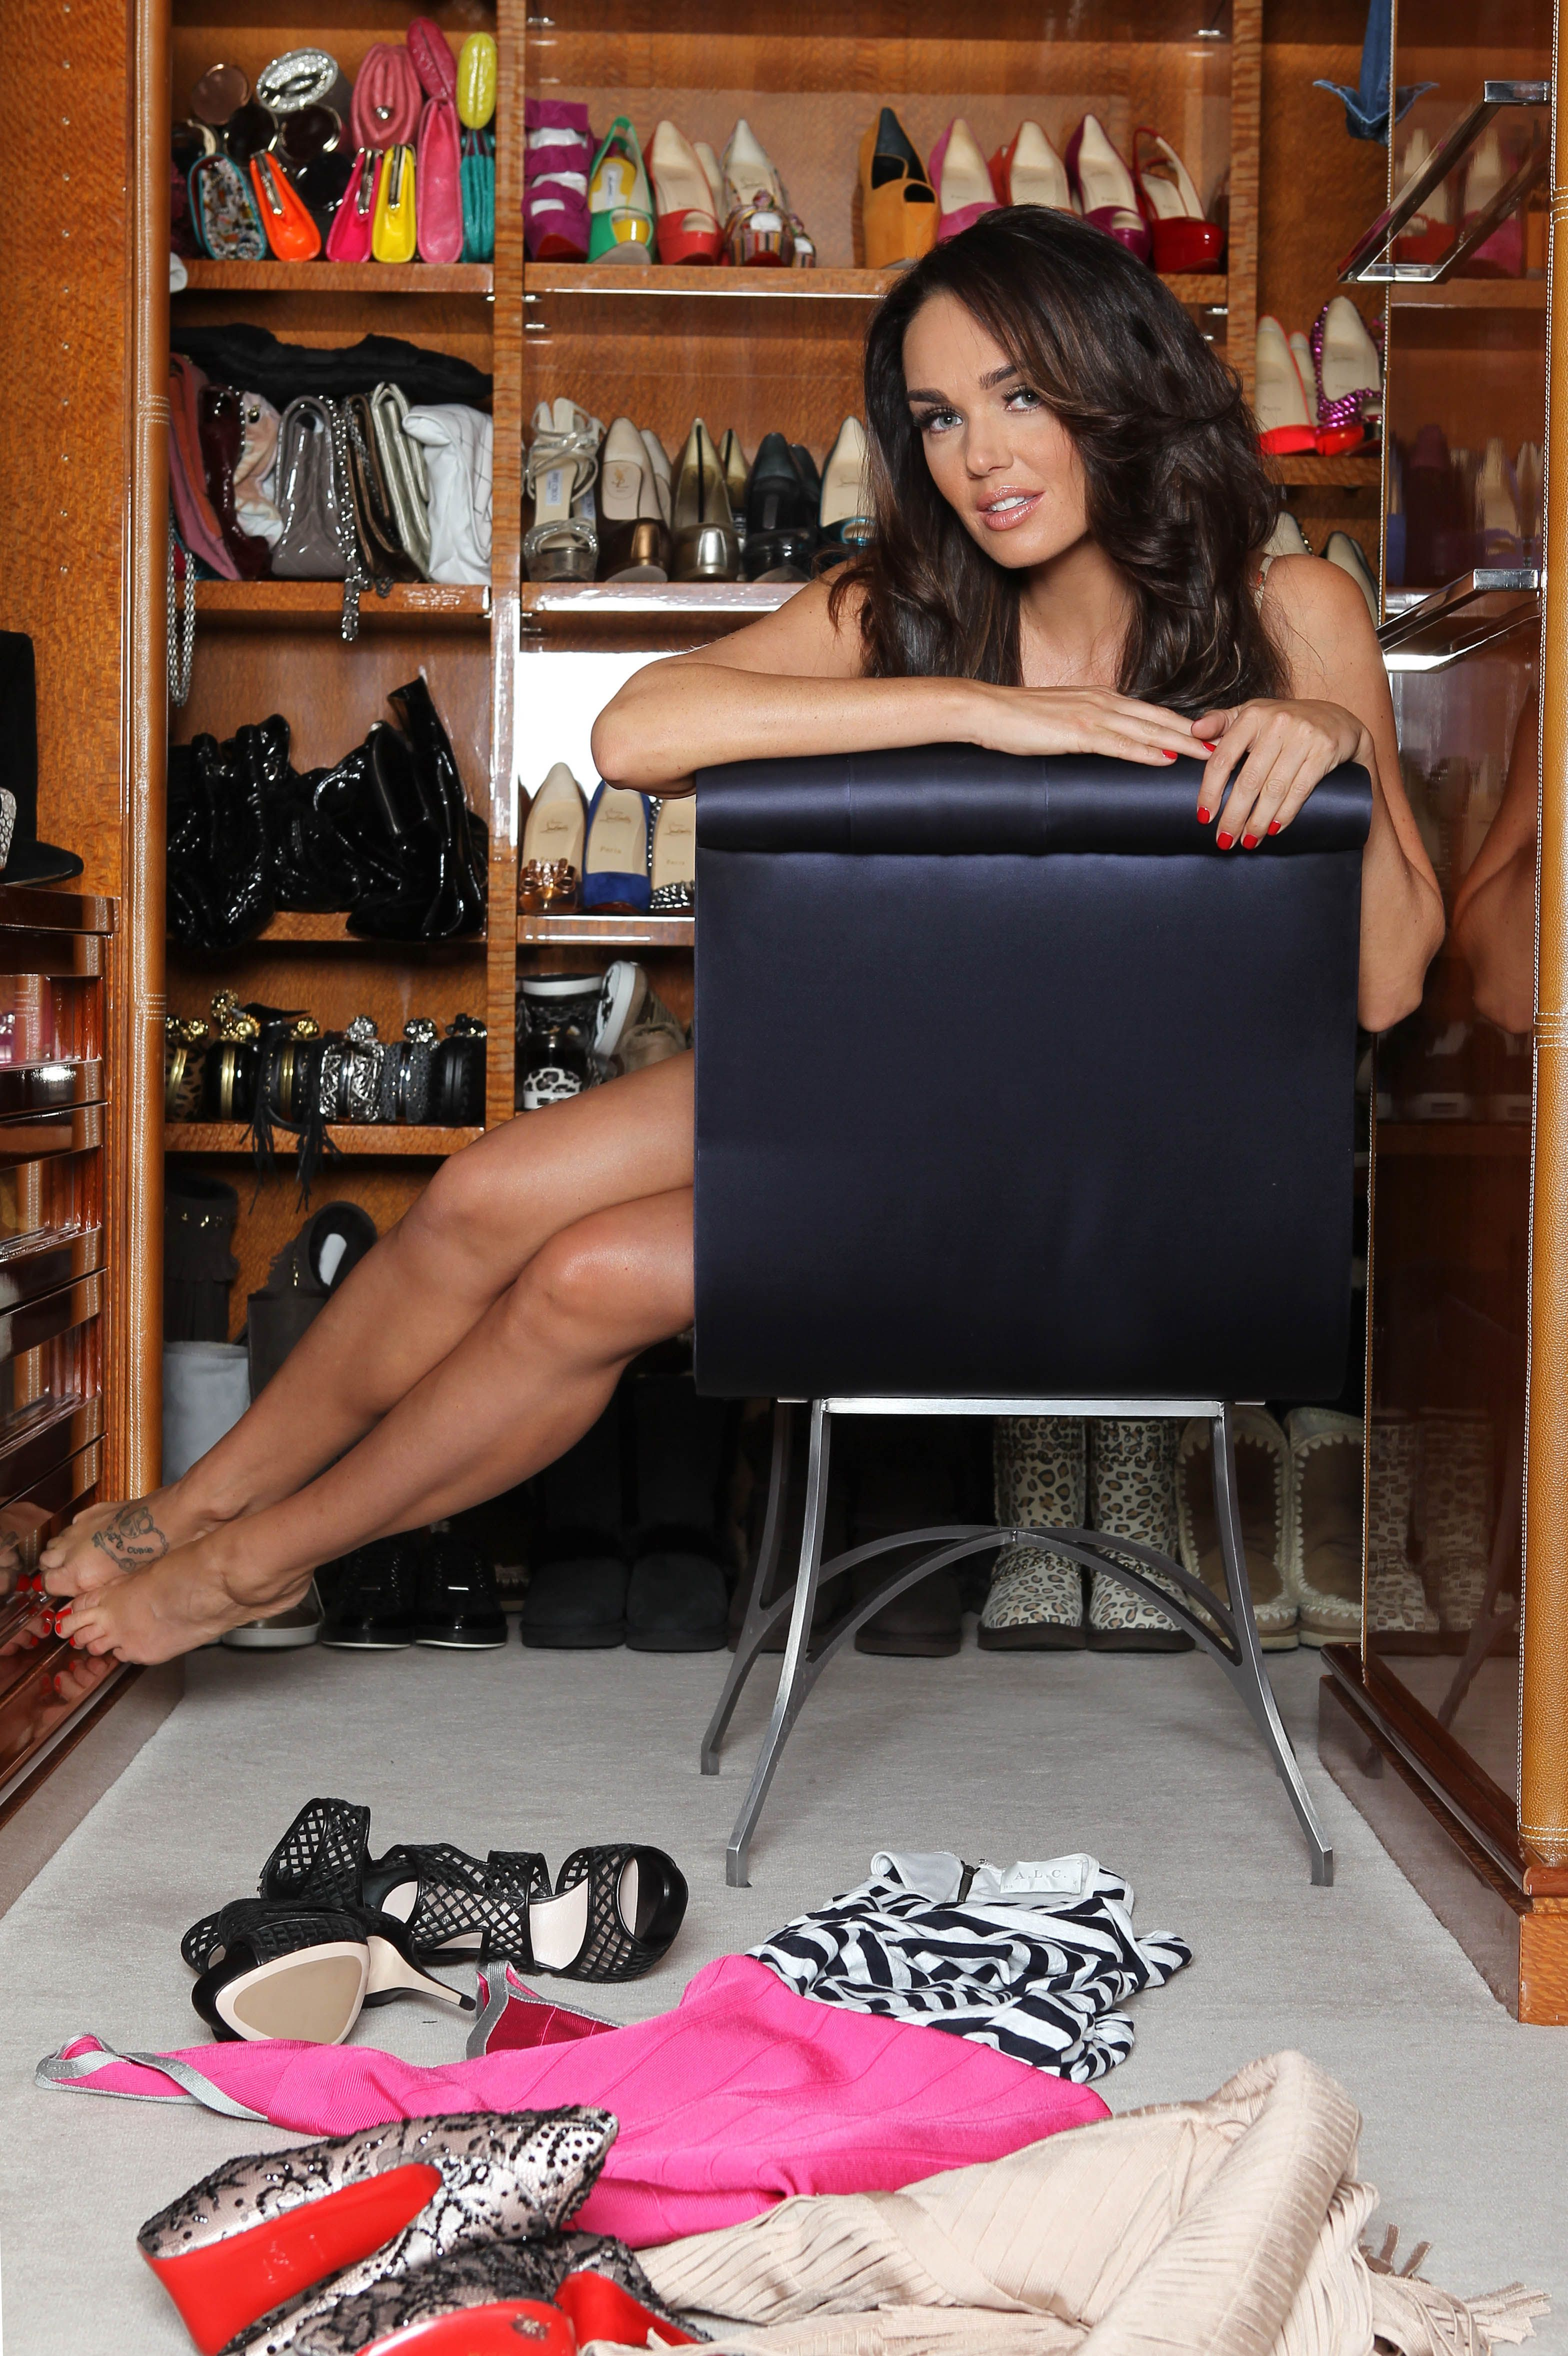 Tamara Ecclestone Feet JPEG Image 3136 — 4712 pixels